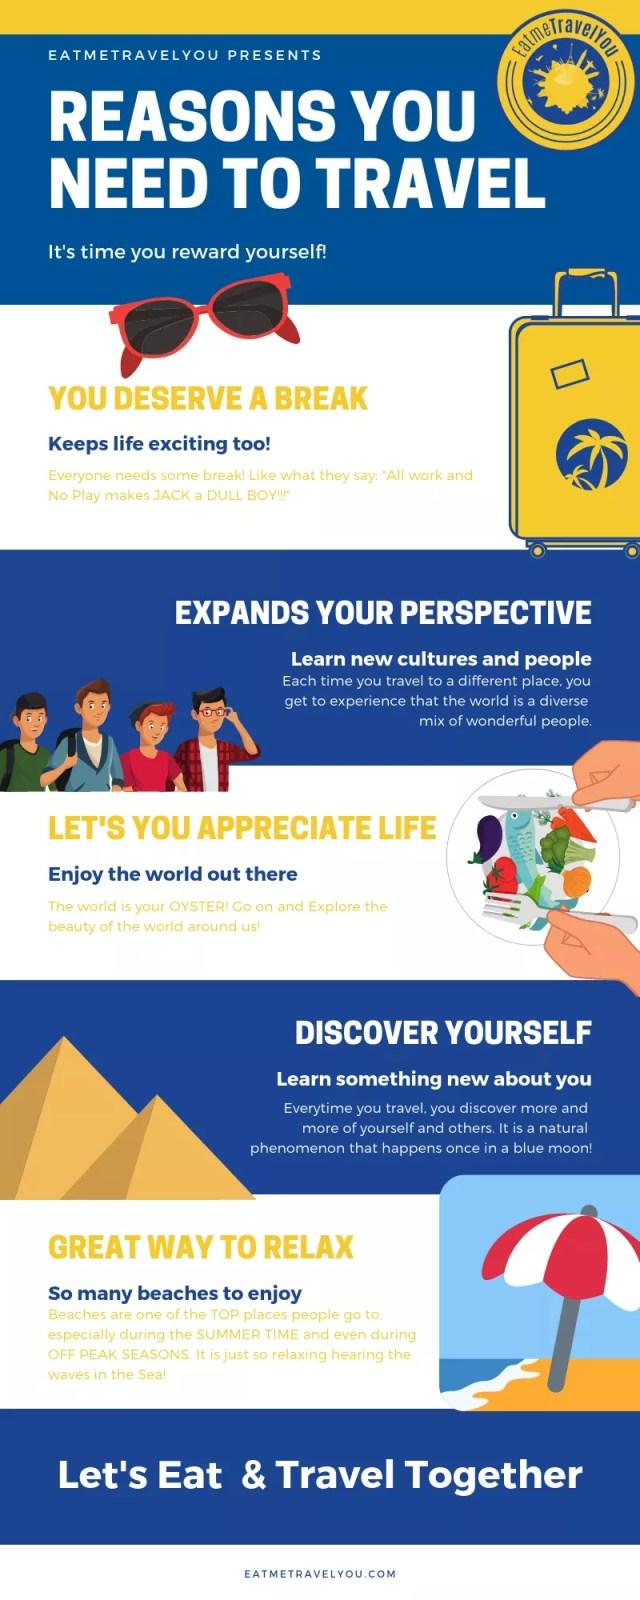 eatmetravelyou infographic